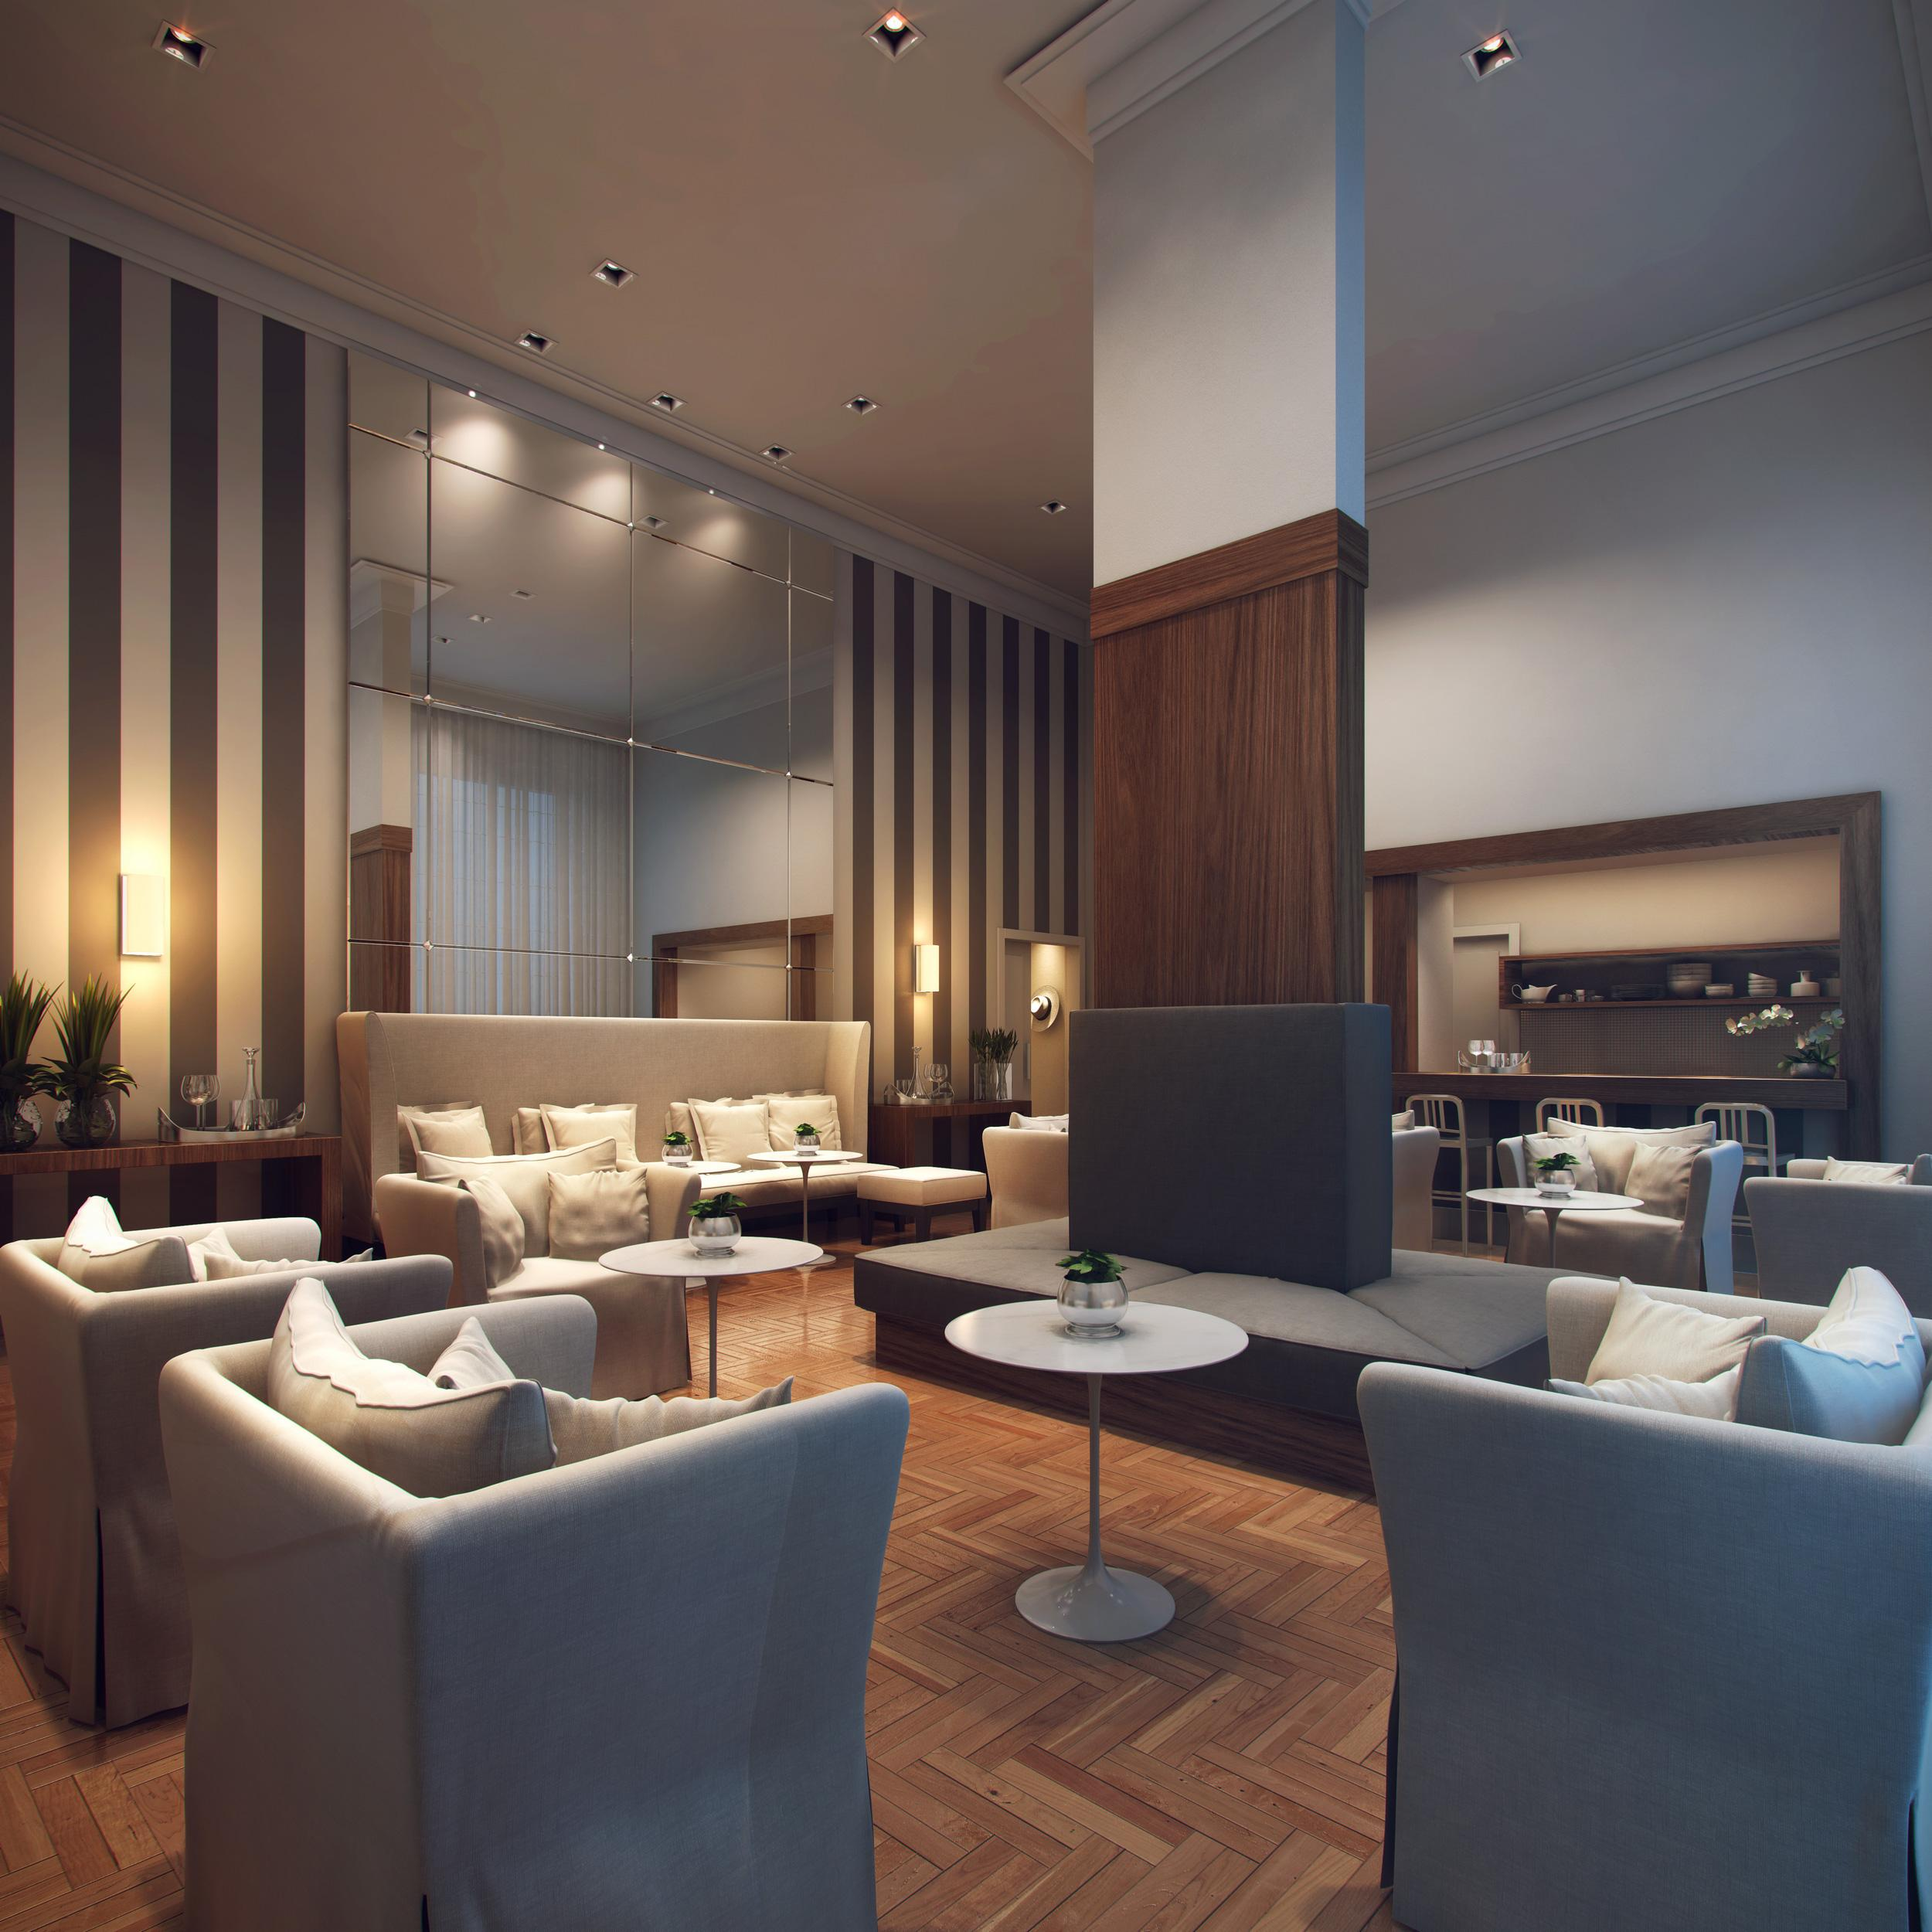 Lazer   1550 Batel (Home Batel) – Apartamentono  Batel - Curitiba - Paraná